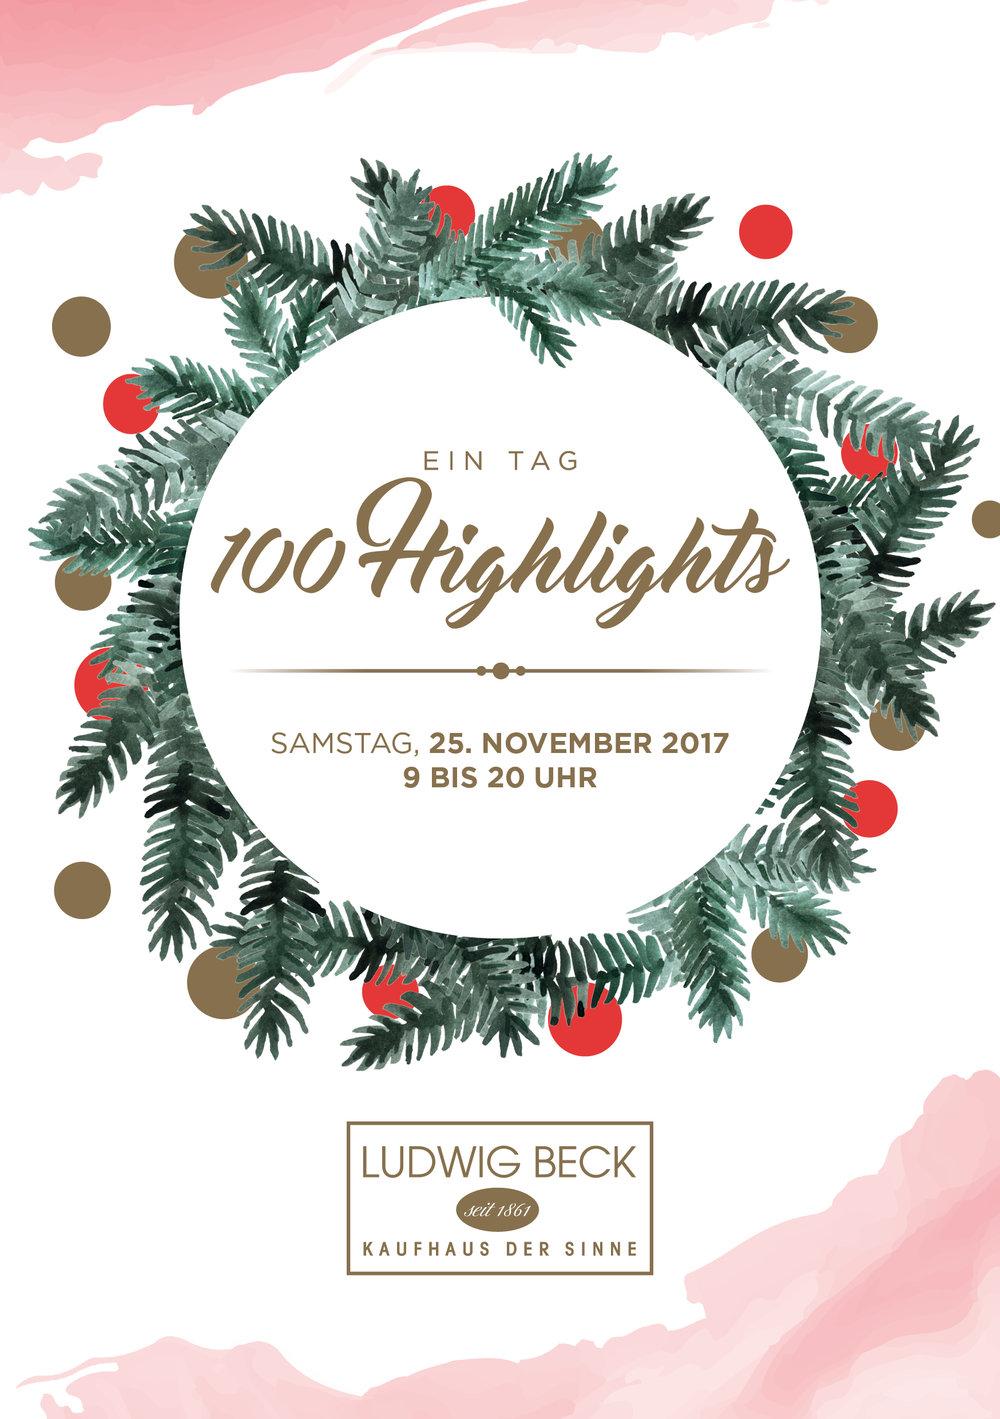 LudwigBeck_100.Highlights_25.11.jpg